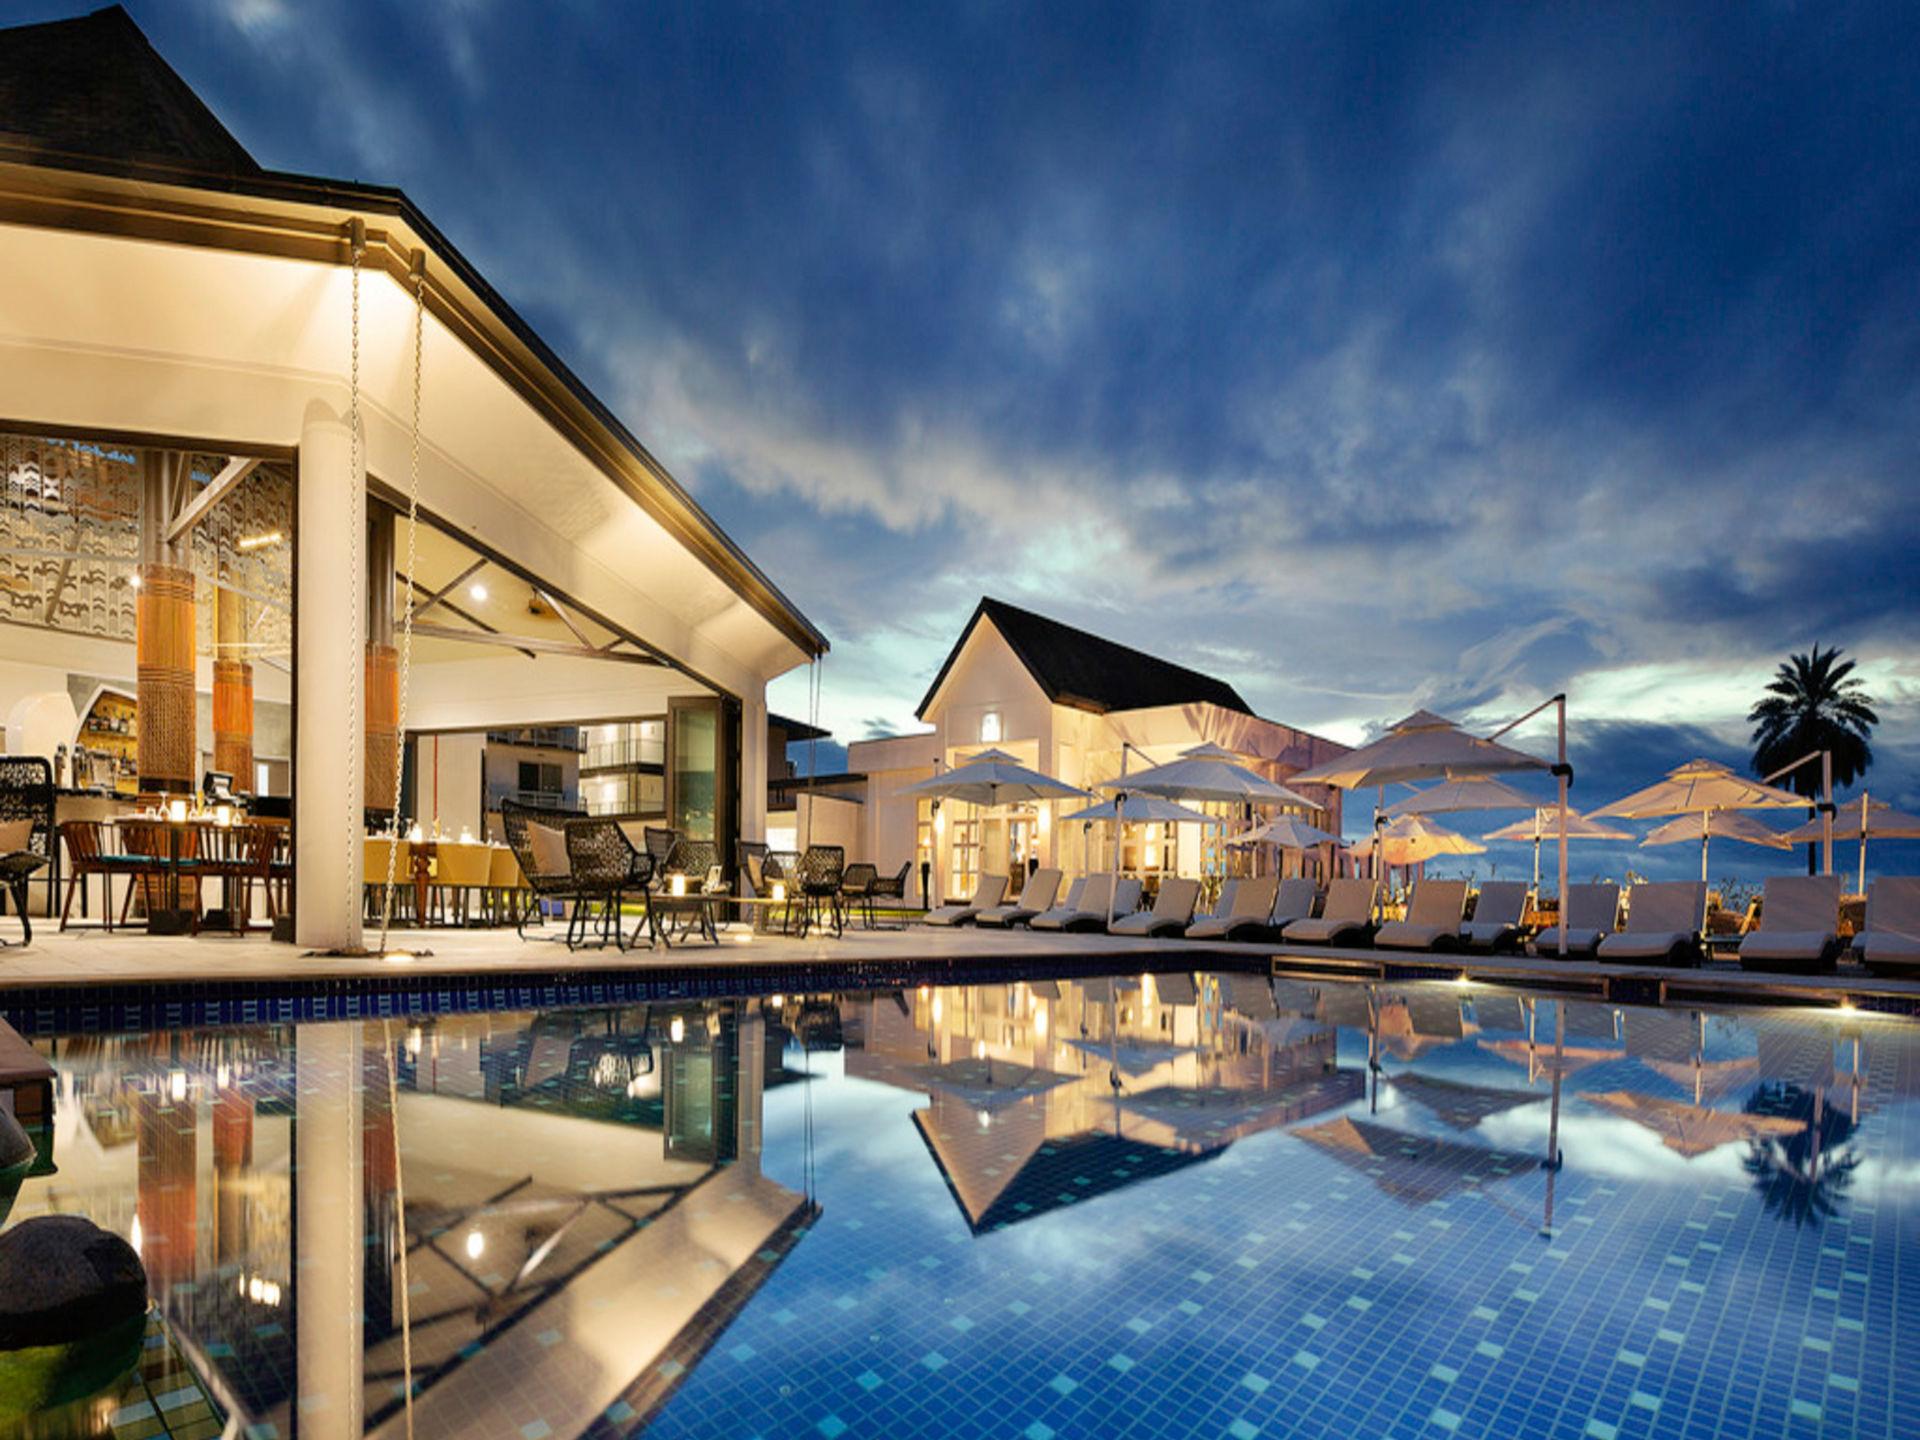 COVID-19 Impact on Golf & Resorts